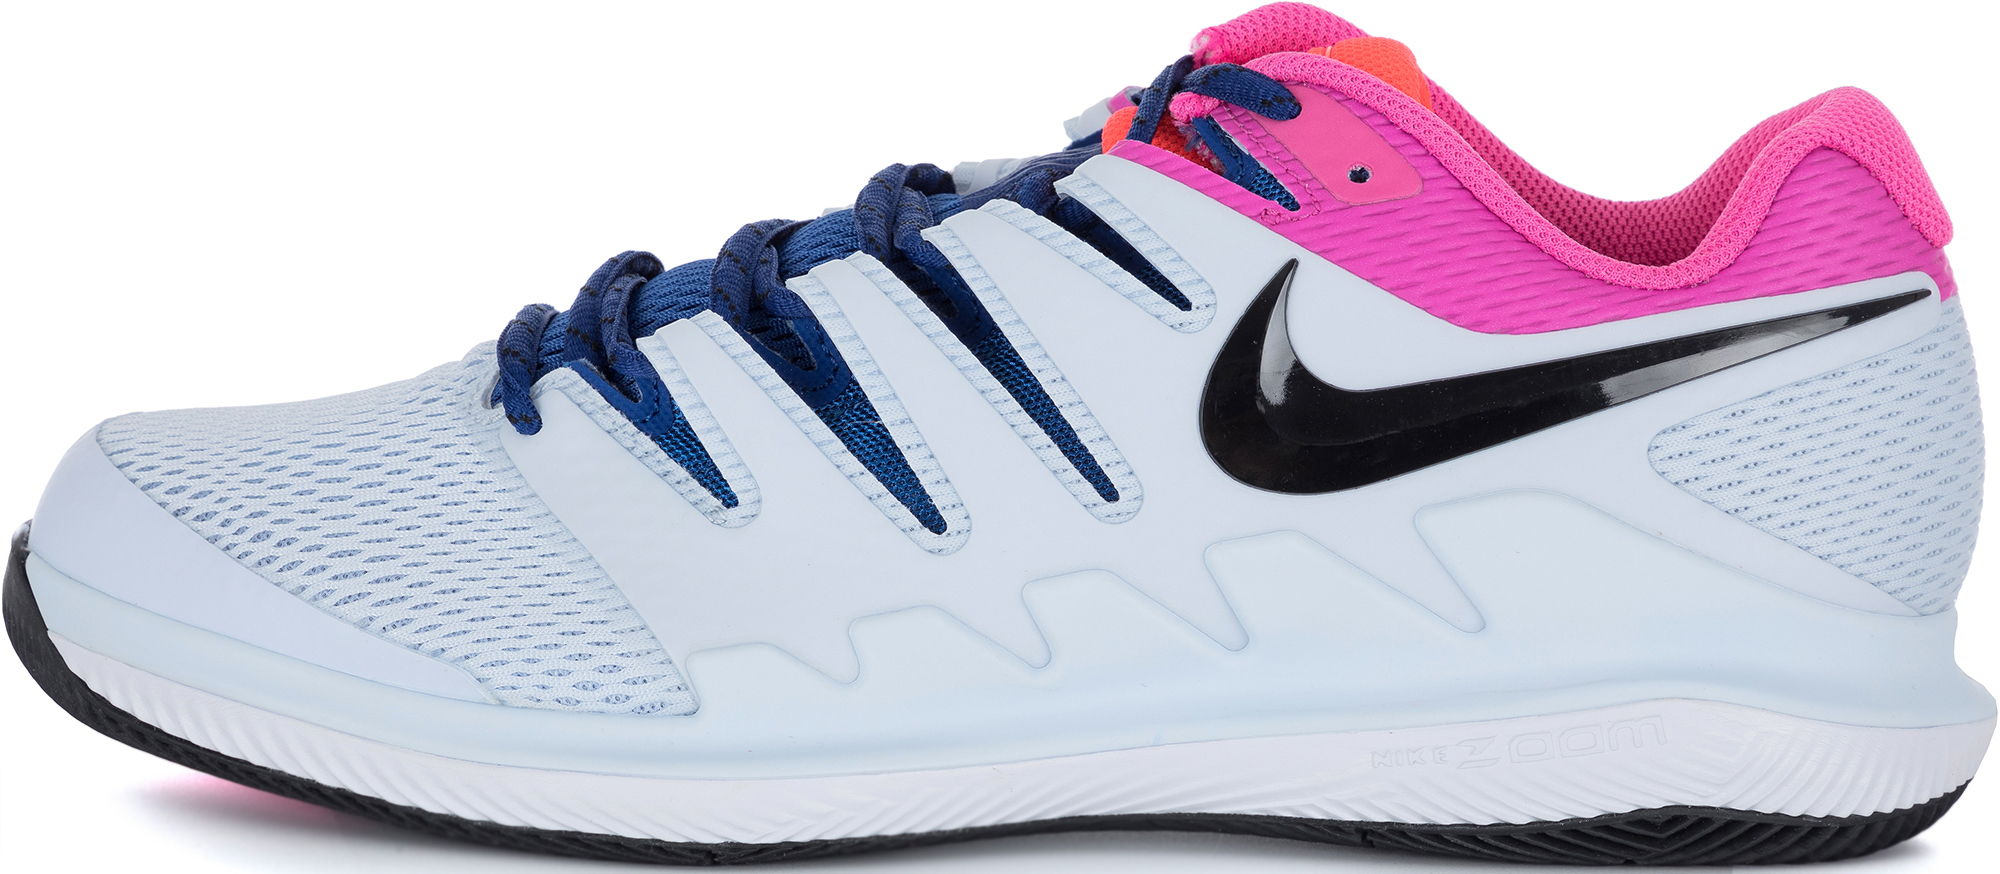 sports shoes fed35 08b47 Nike Кроссовки мужские Nike Air Zoom Vapor X Hc, размер 46,5